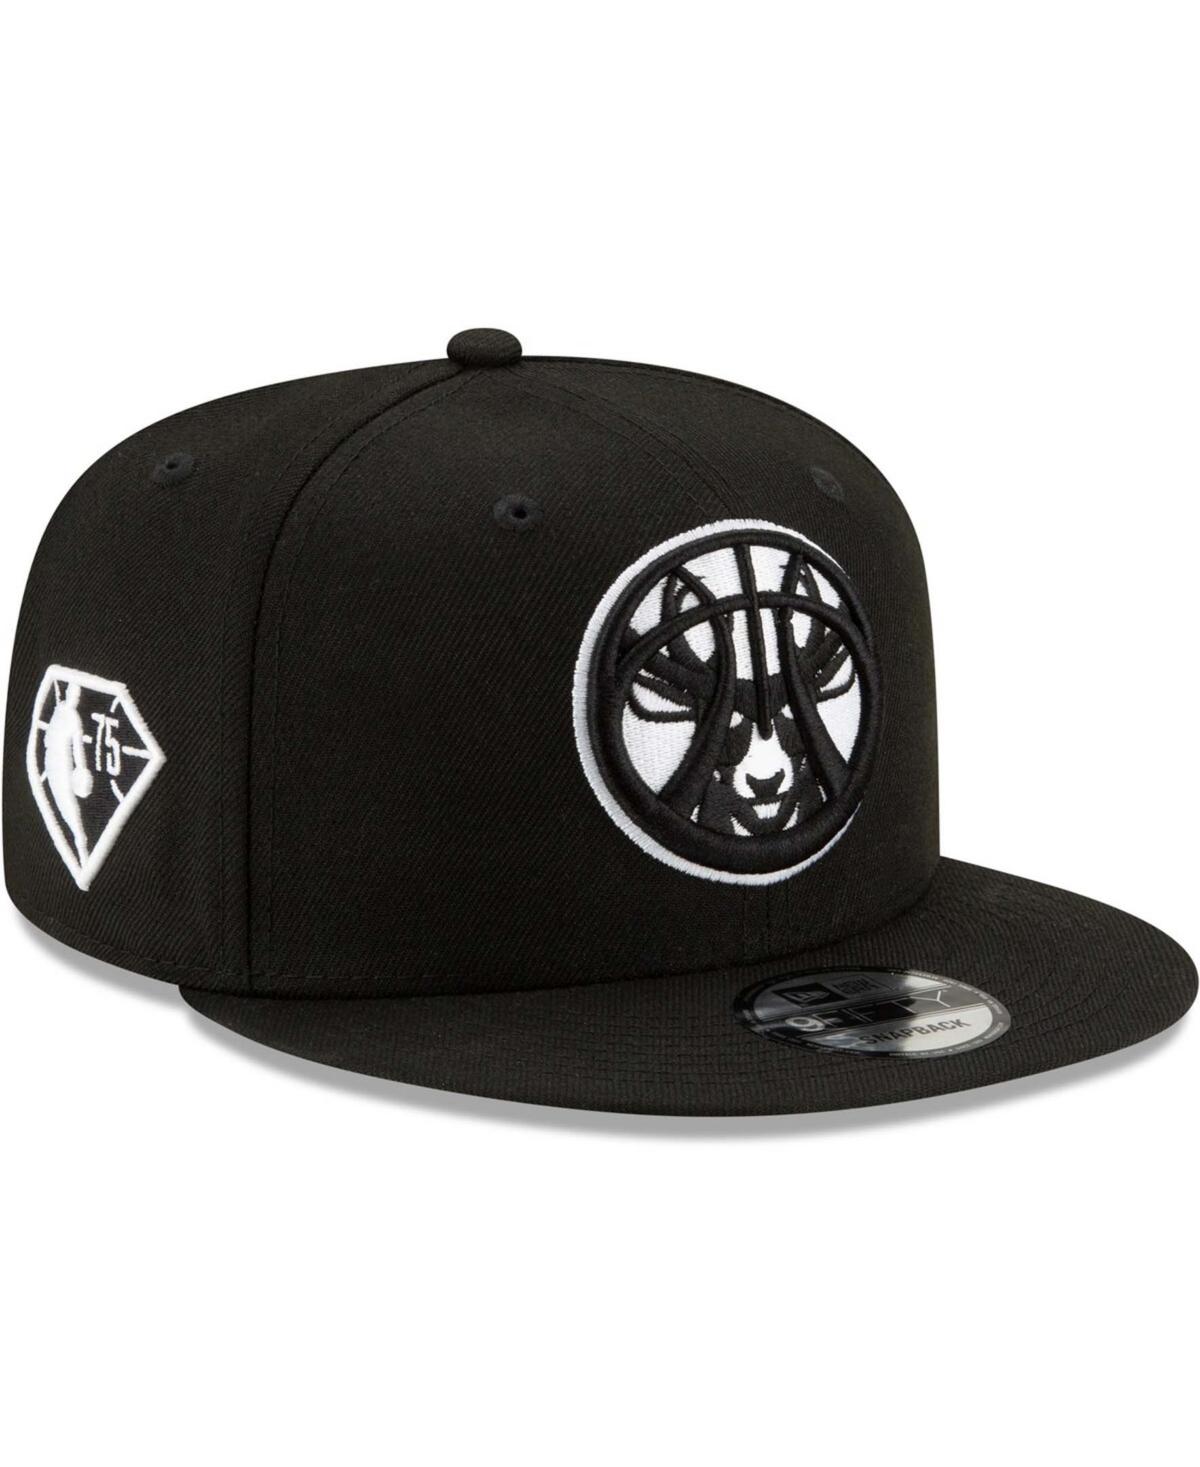 Men's Black Milwaukee Bucks 2021 Nba Draft Alternate 9Fifty Snapback Hat